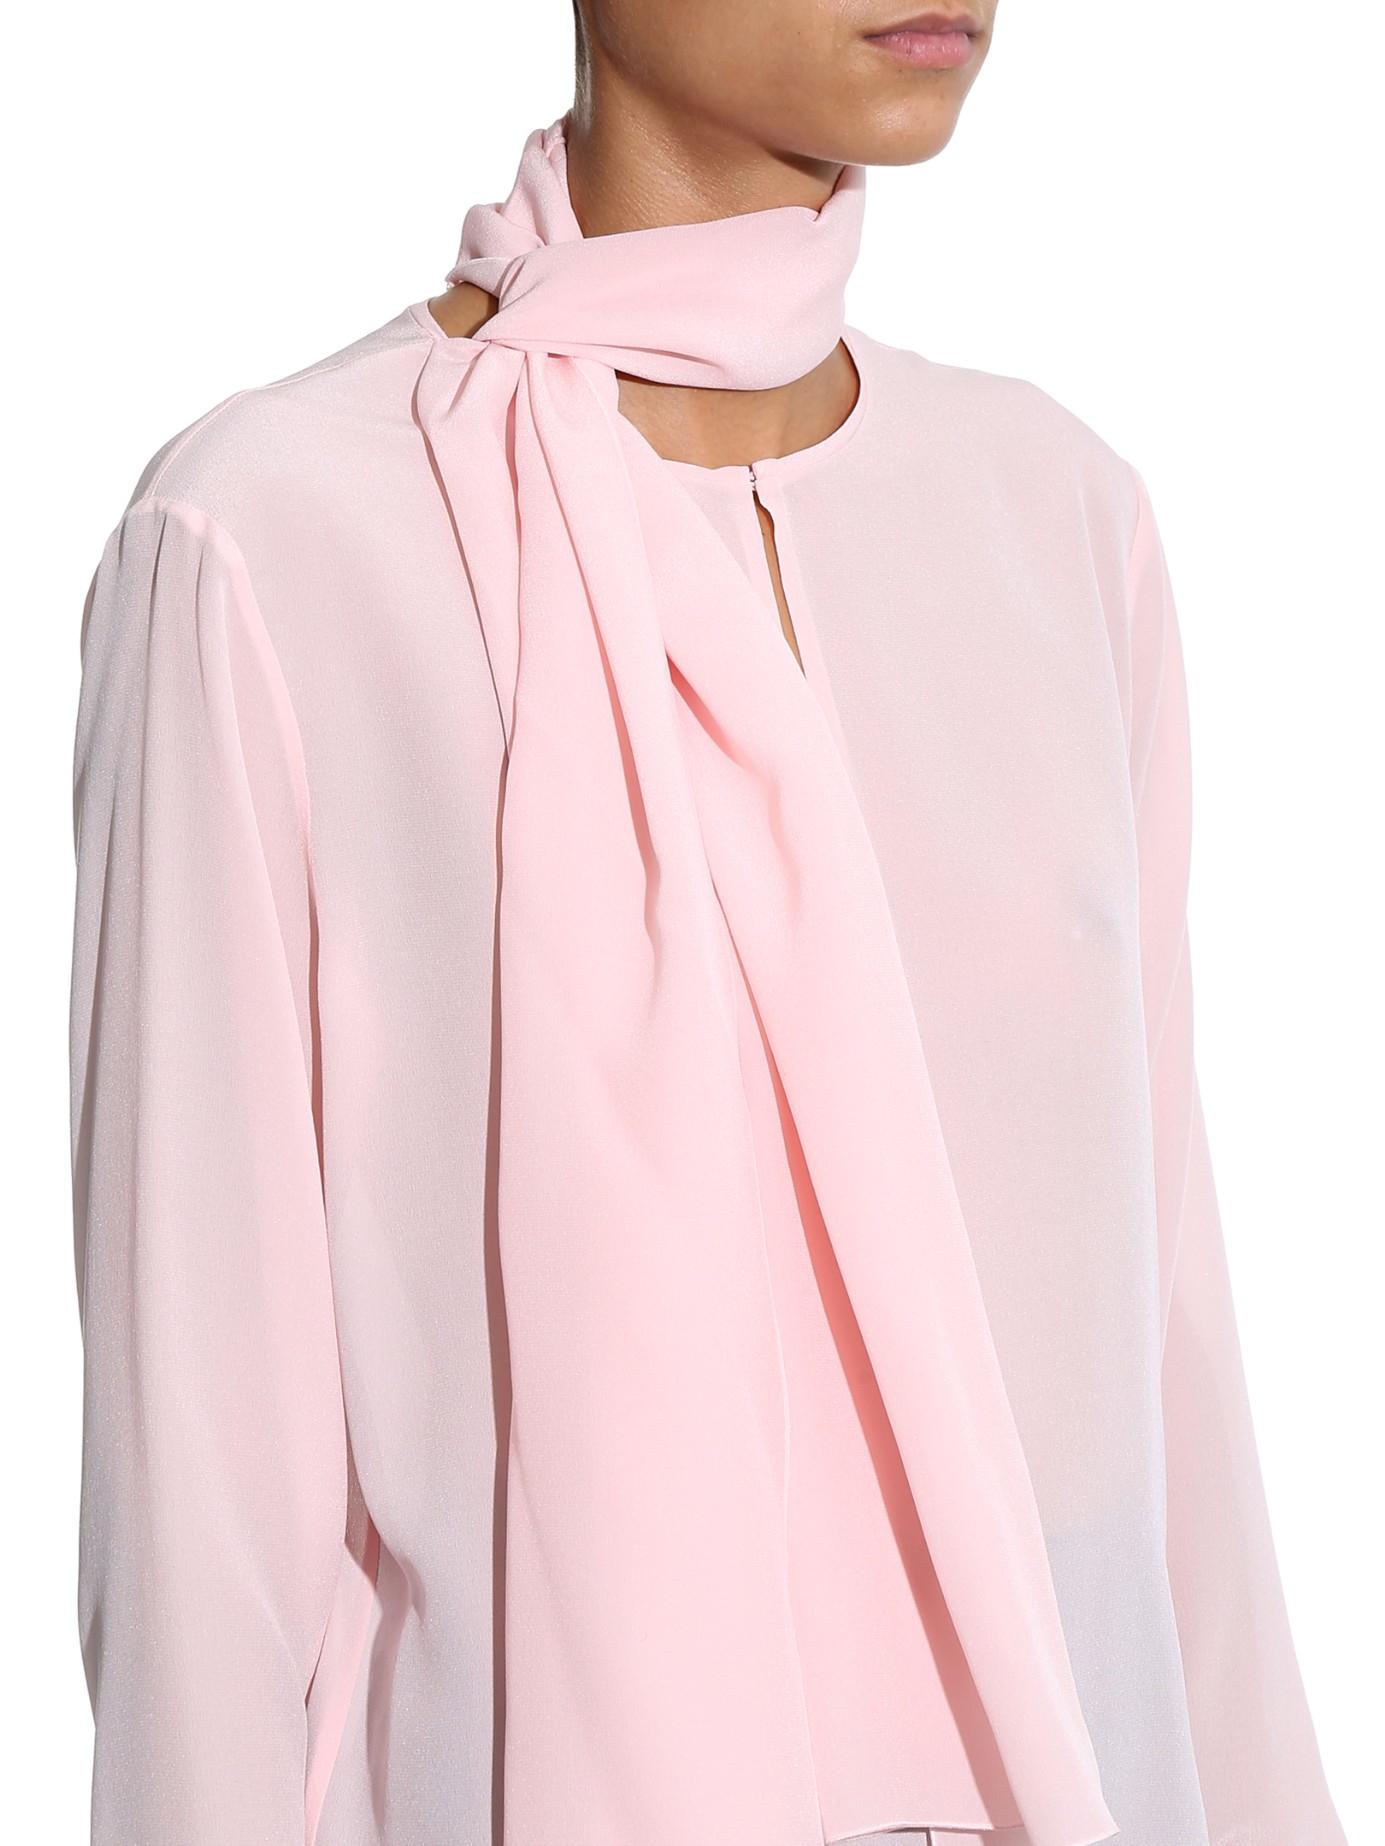 5d1b9af2bd9e1c Bottega Veneta Silk Crepe De Chine Blouse in Pink - Lyst